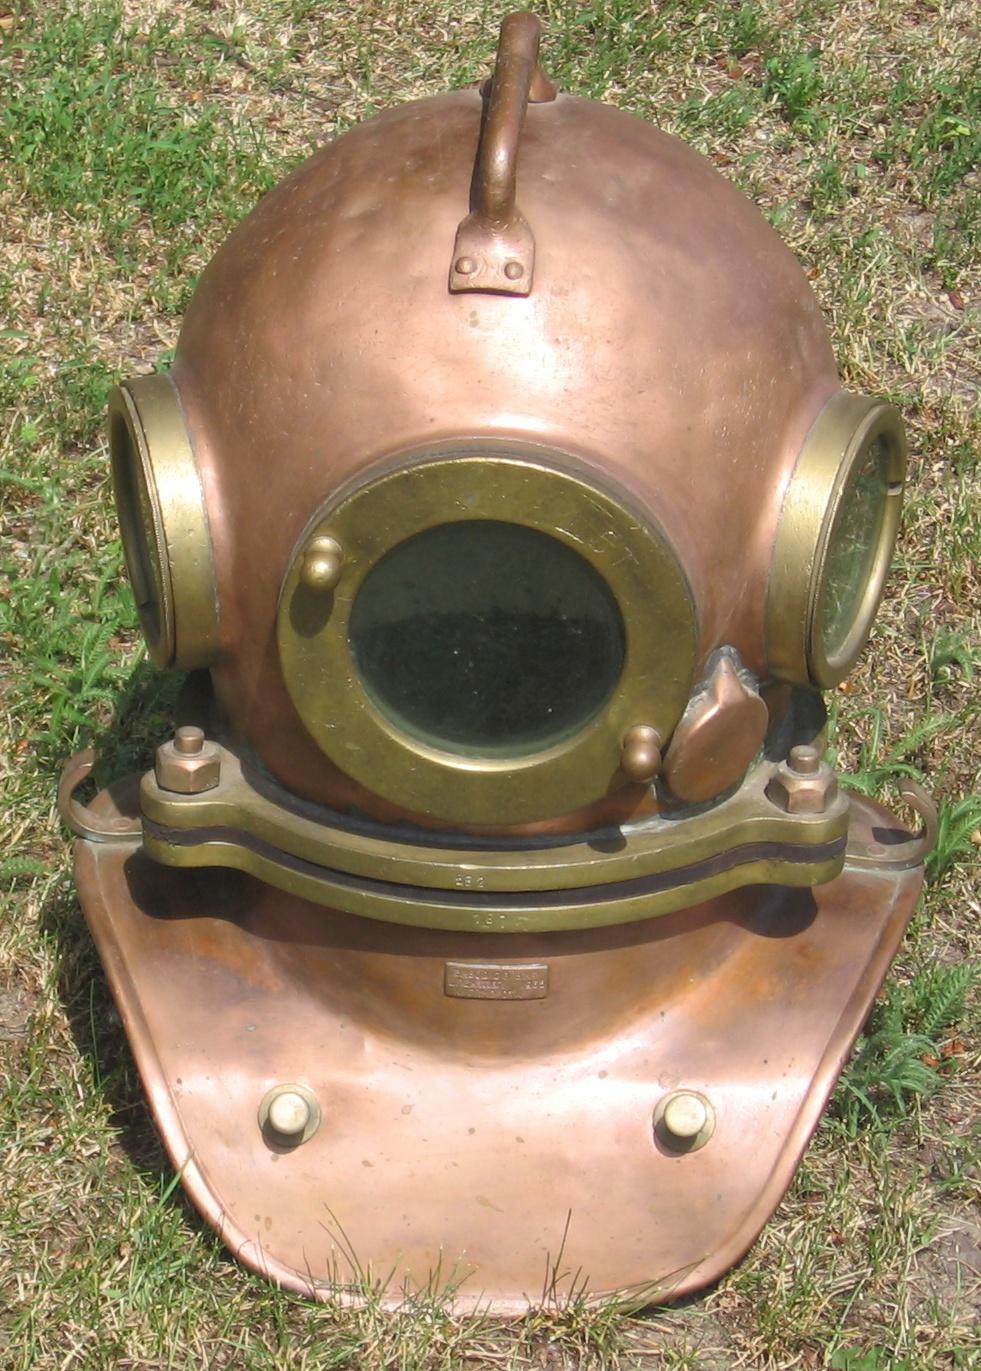 The Smoke Retainer 3000